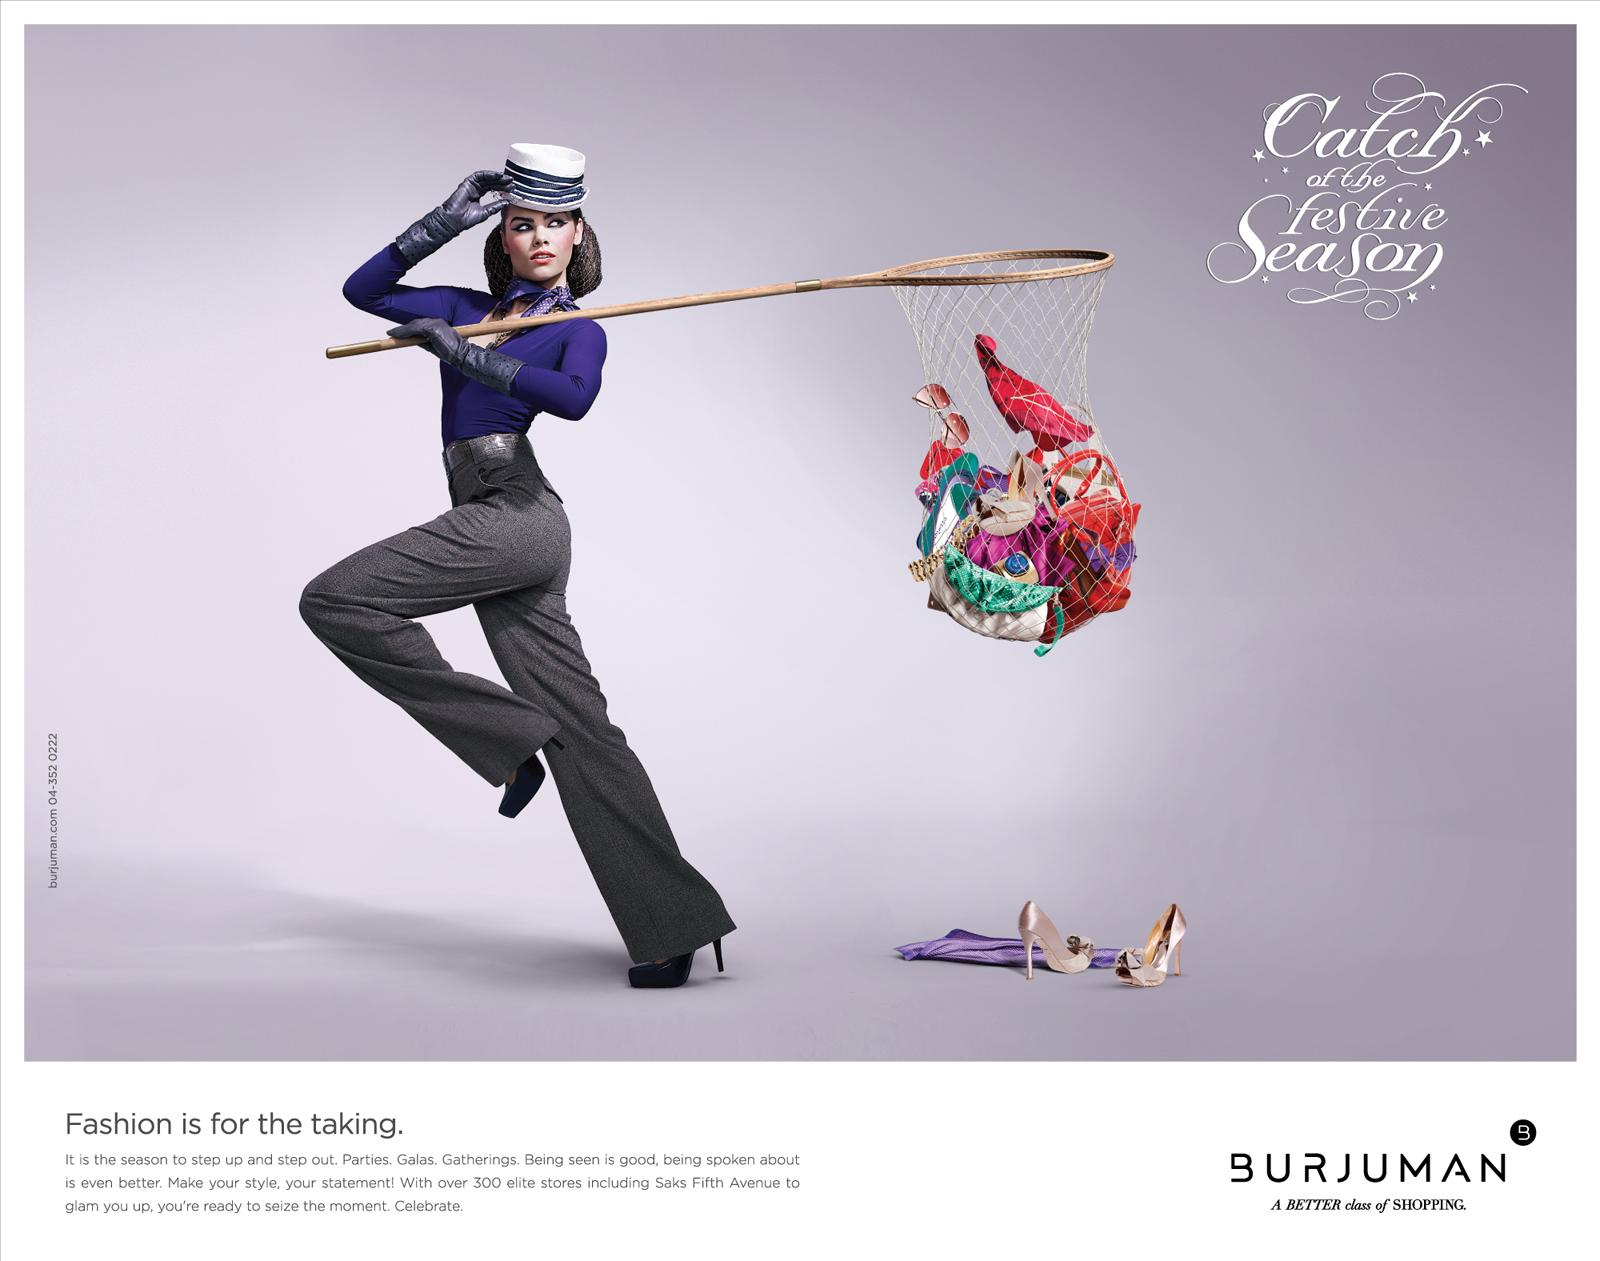 Burjuman Print Ad -  Catch of the Season, 1